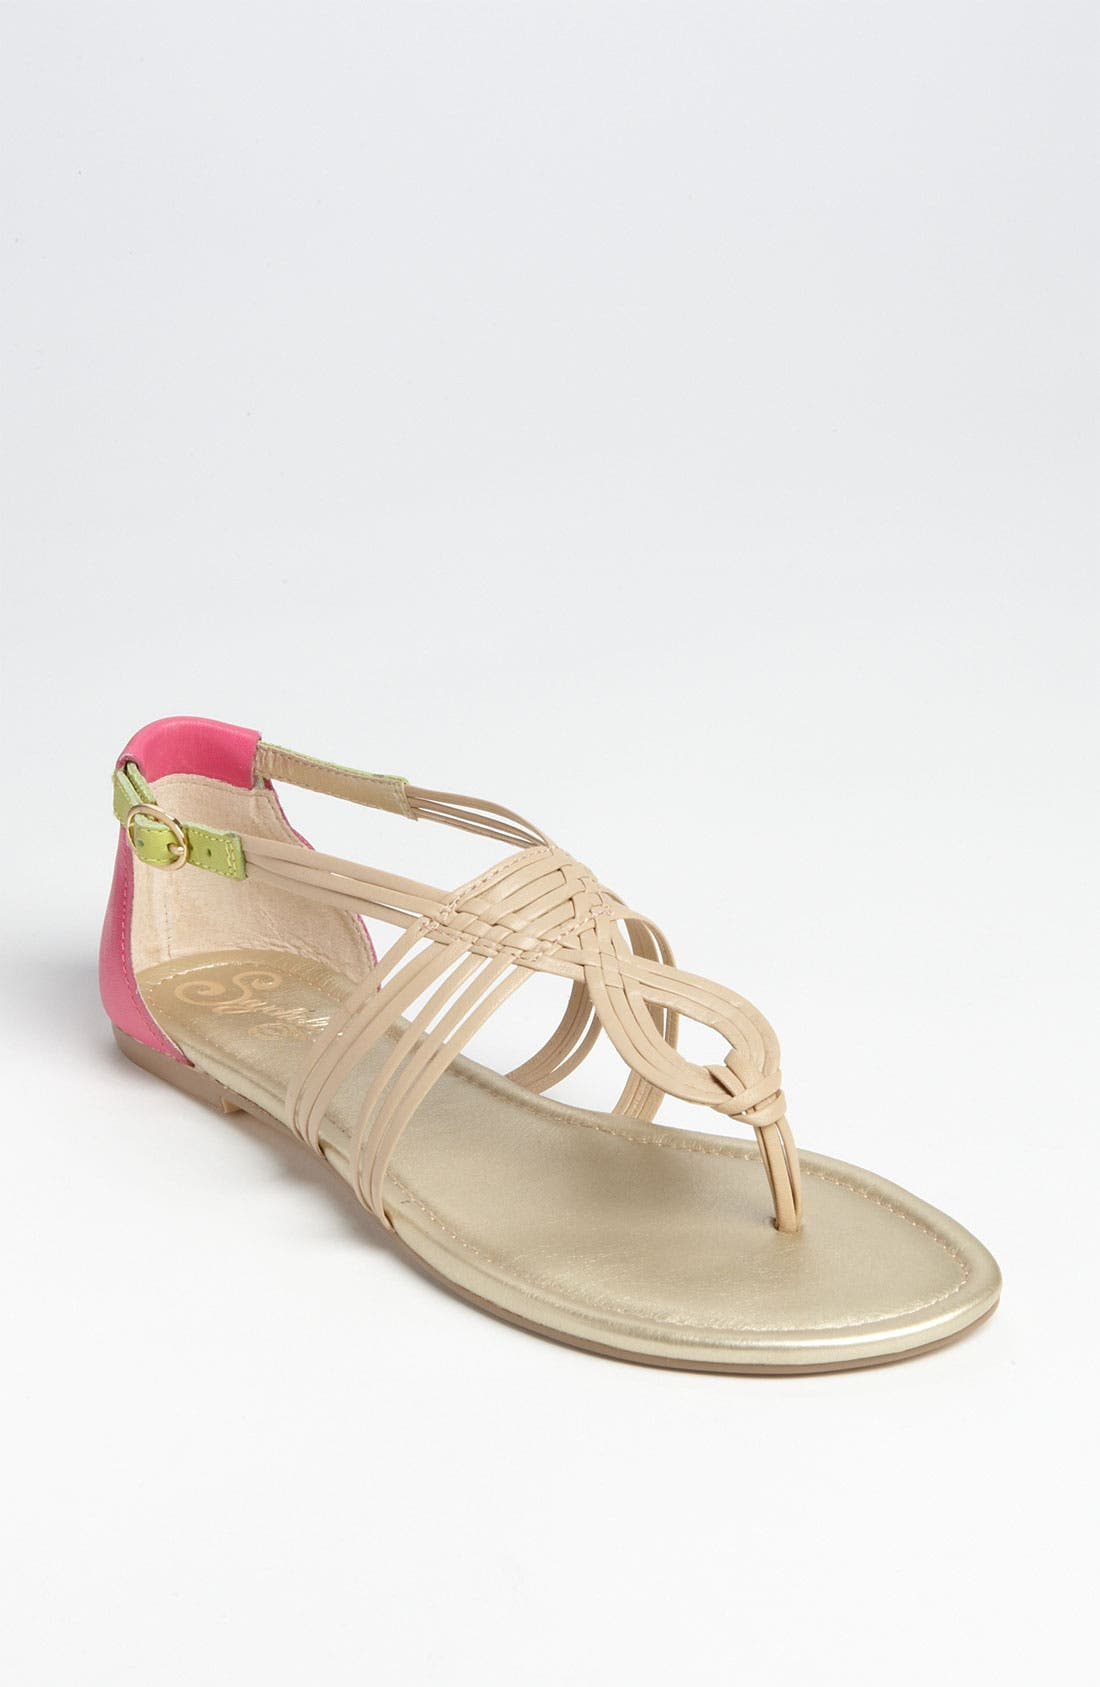 Alternate Image 1 Selected - Seychelles 'Coy' Sandal